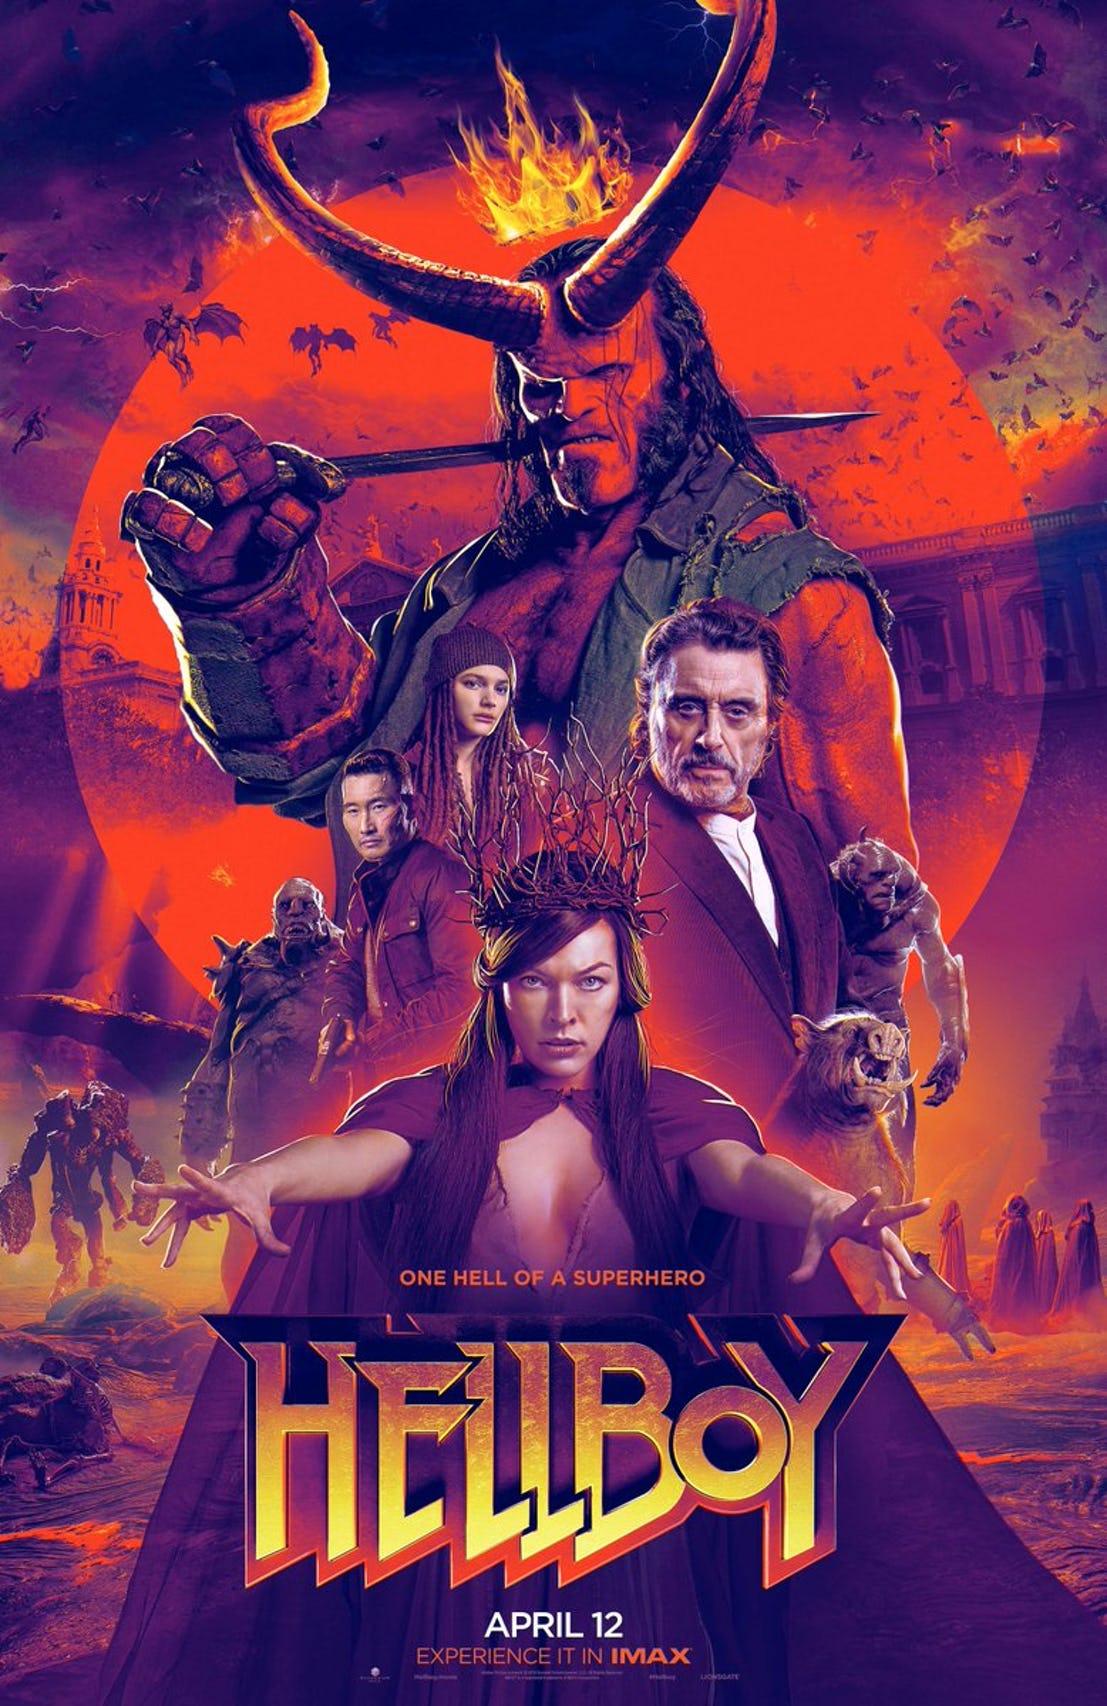 hellboy-poster1.jpg